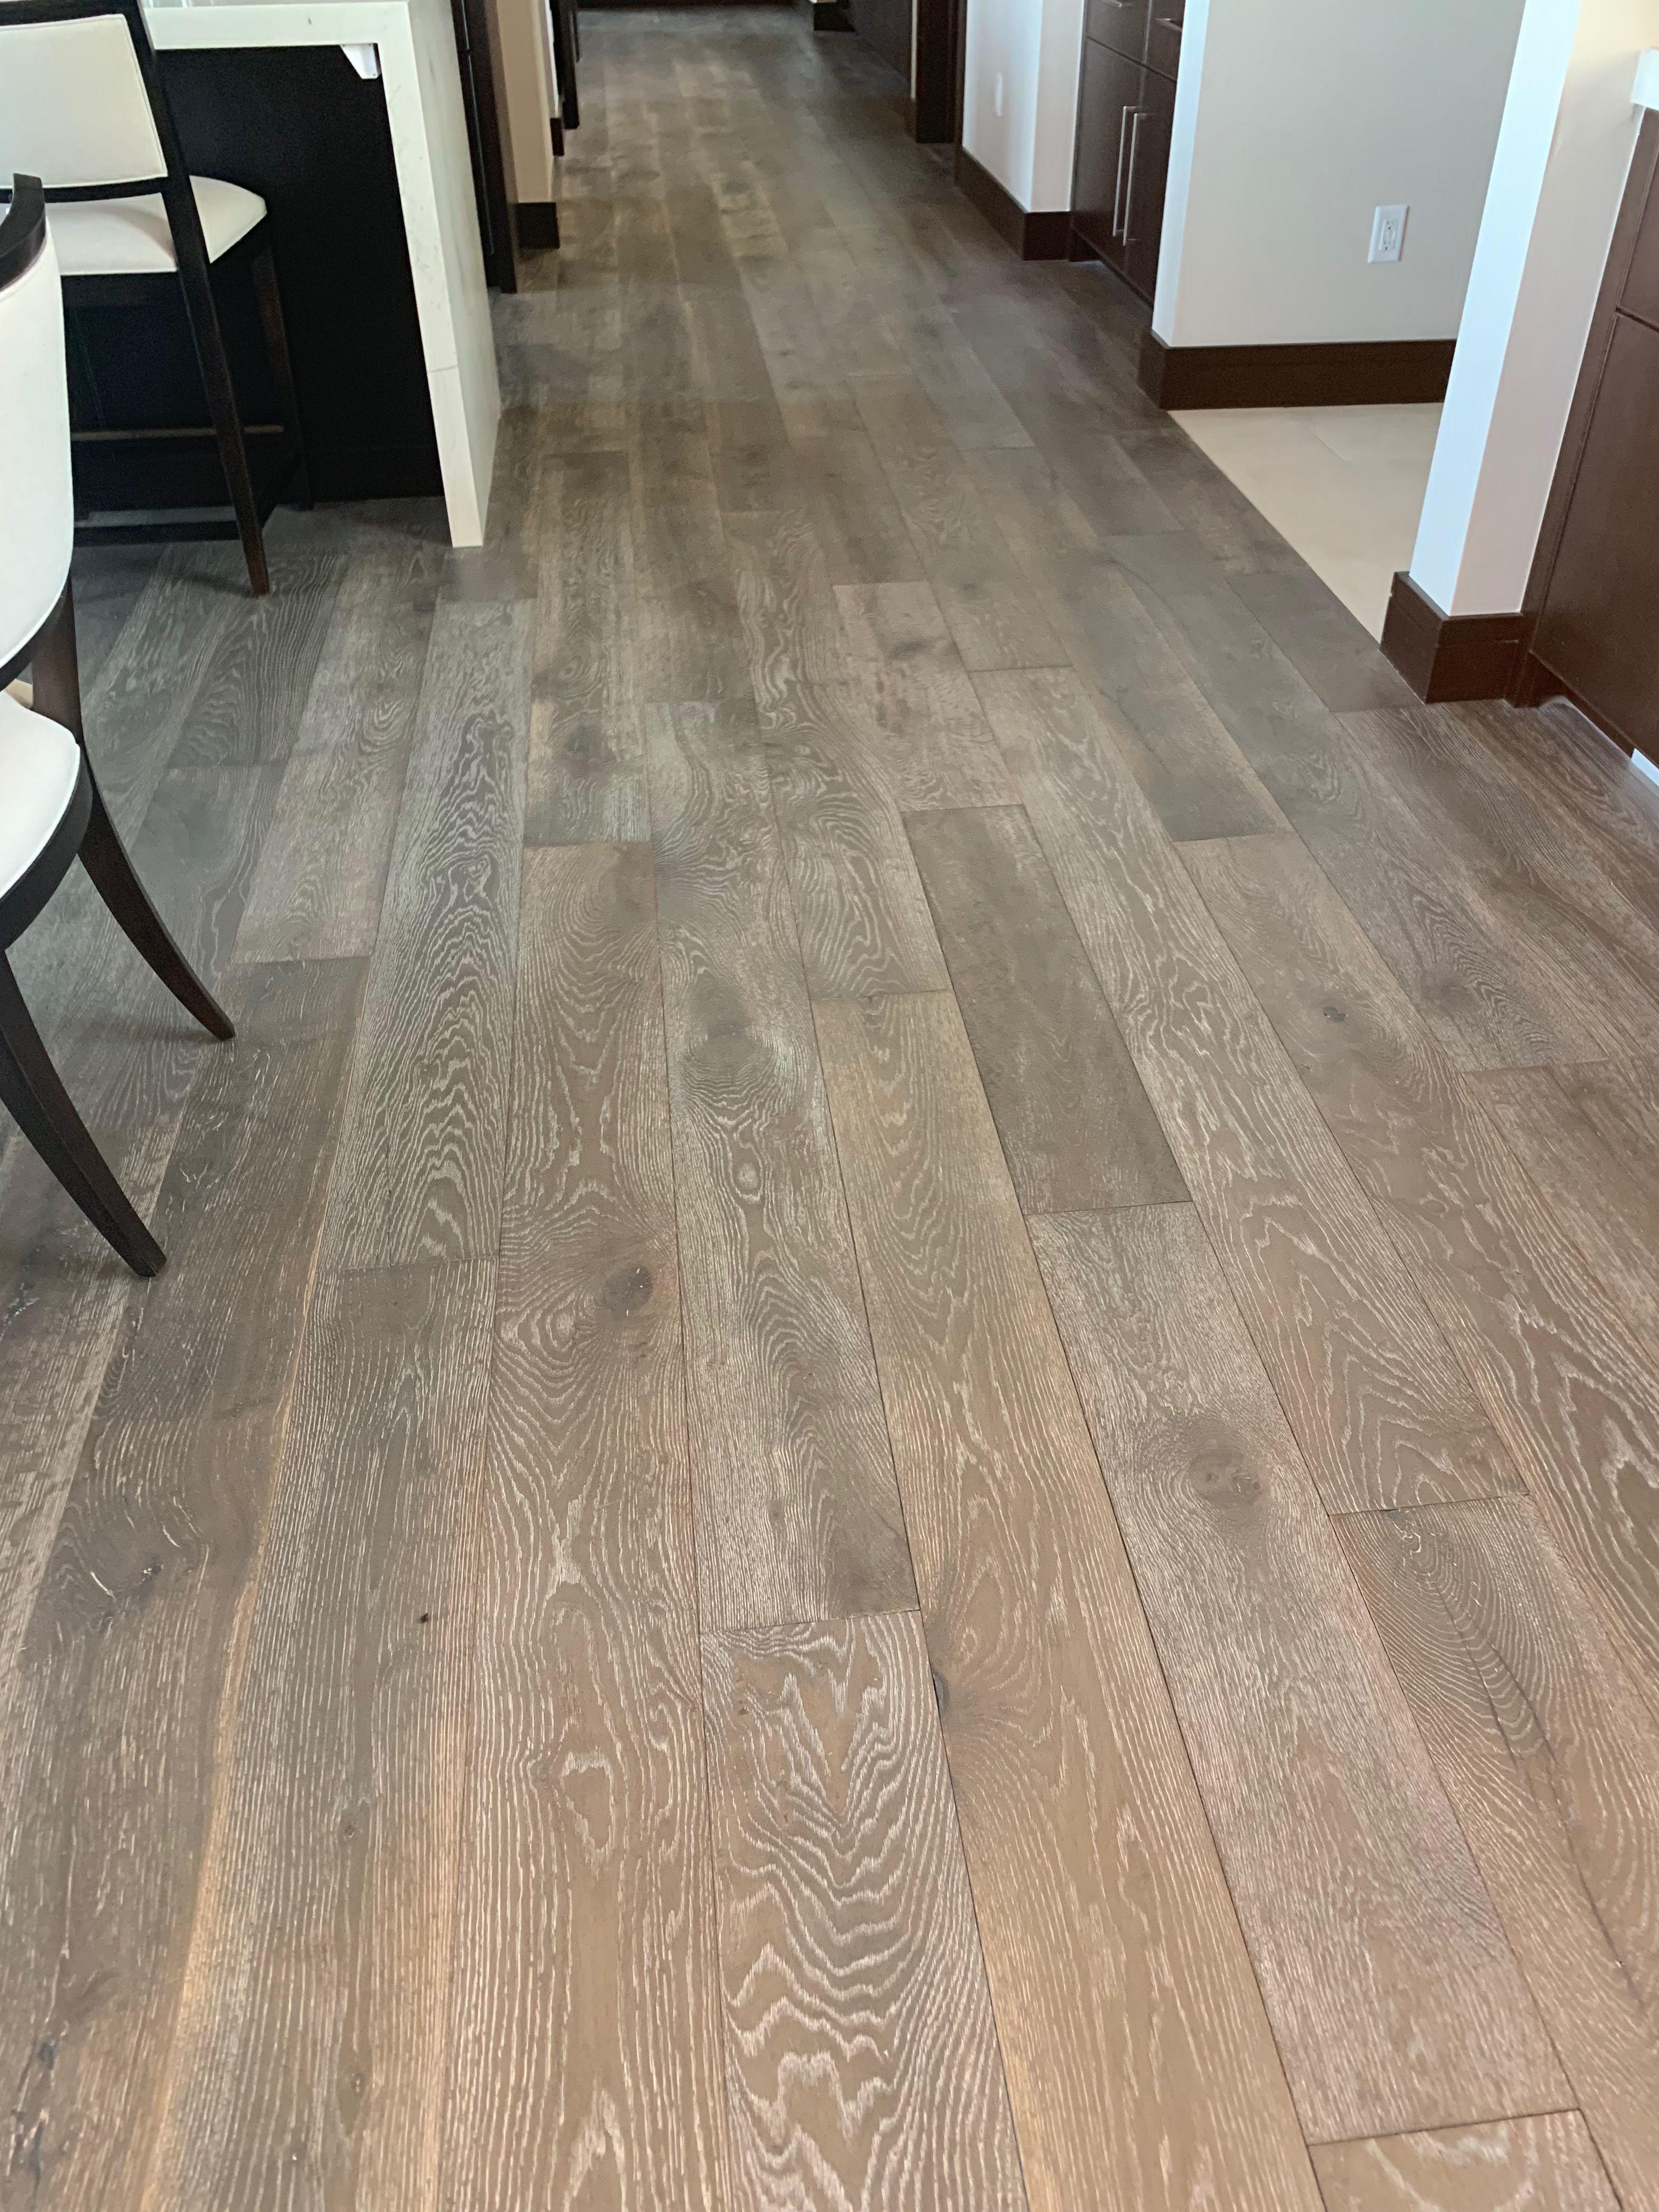 Engineered Hardwood Flooring On All The First Floor Excluding Bedroom Bathroom And Closets Engineered Hardwood Flooring Hardwood